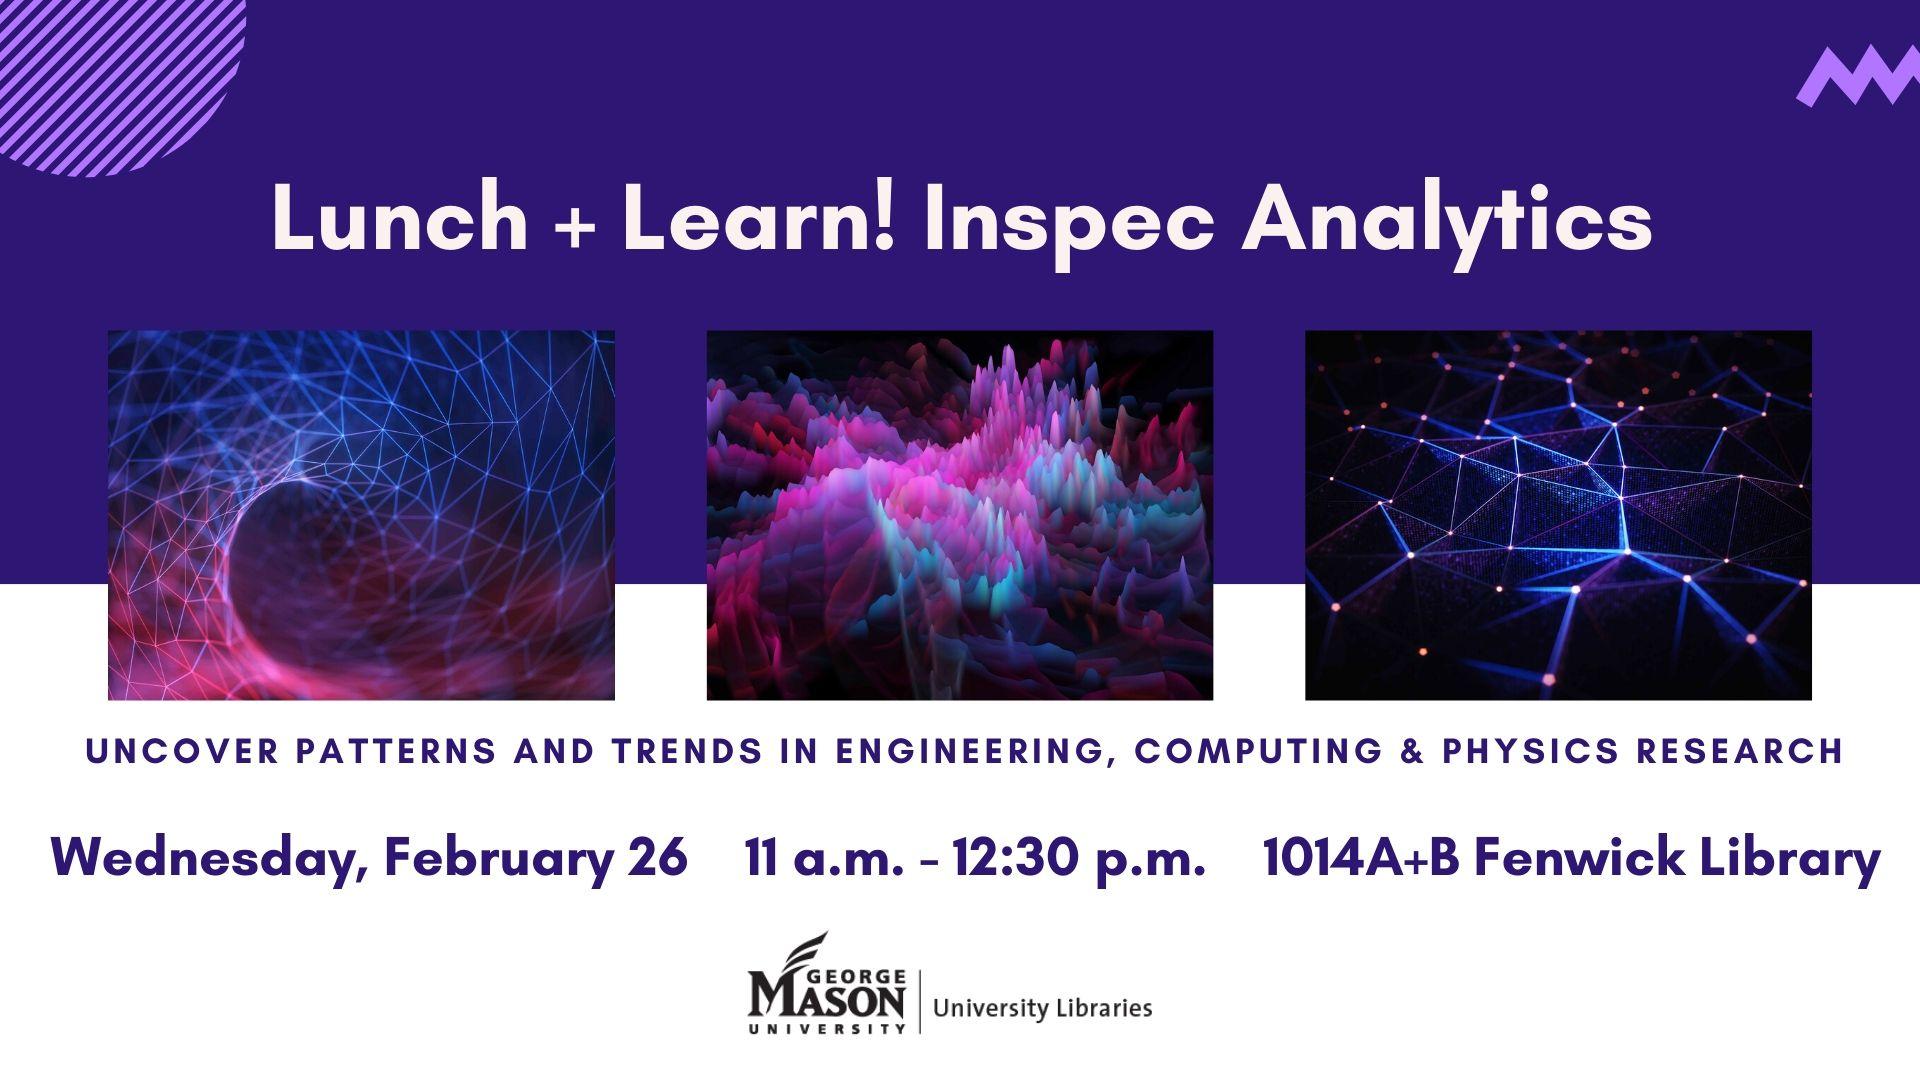 Lunch & Learn! IET Inspec Analytics